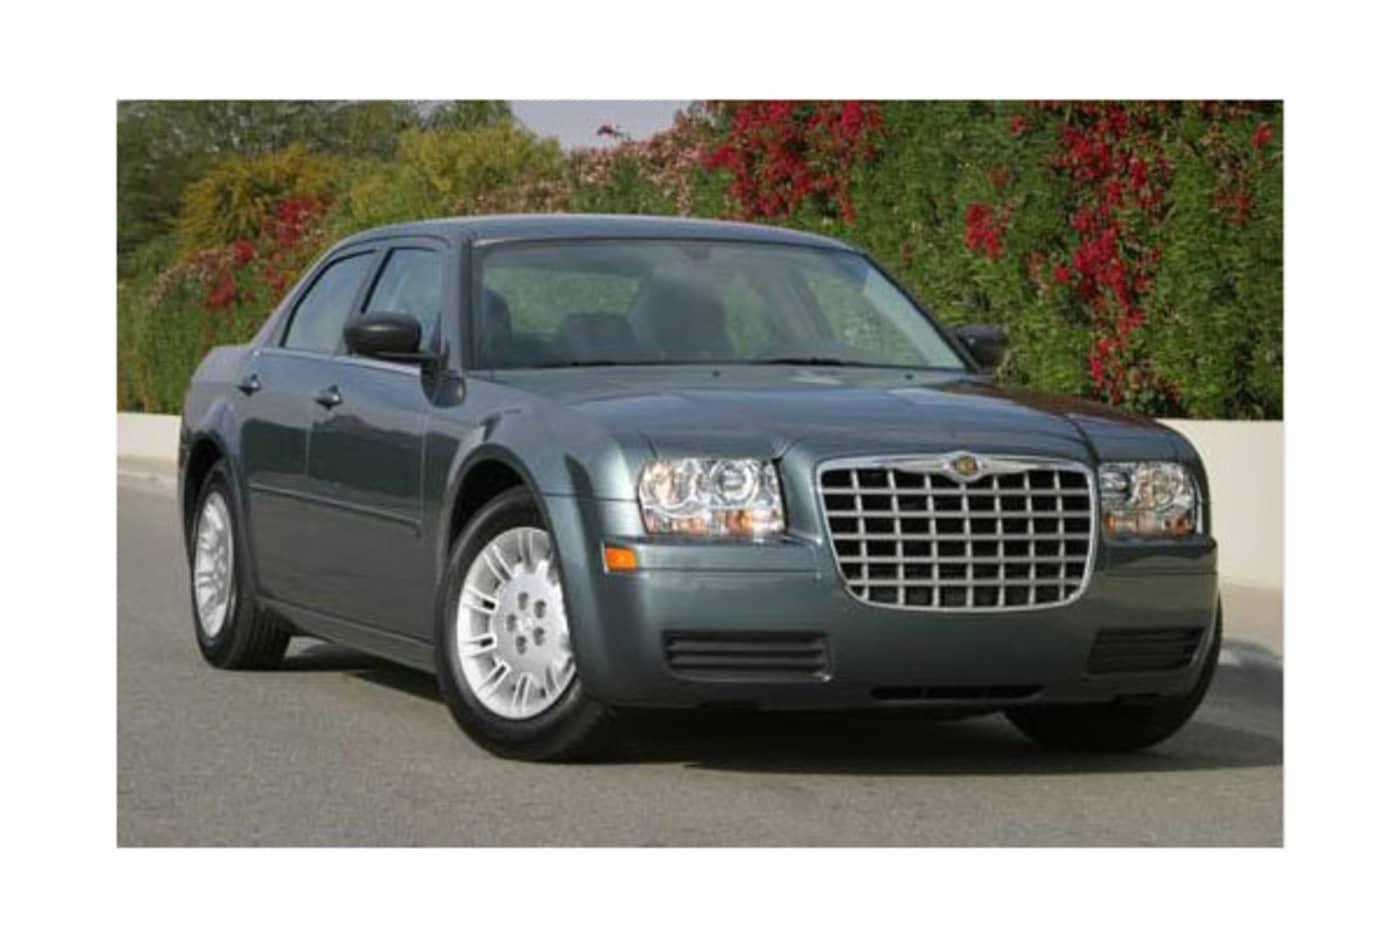 48438686 Chrysler-300-Most-Stolen-Luxury-Cars-CNBC.jpg